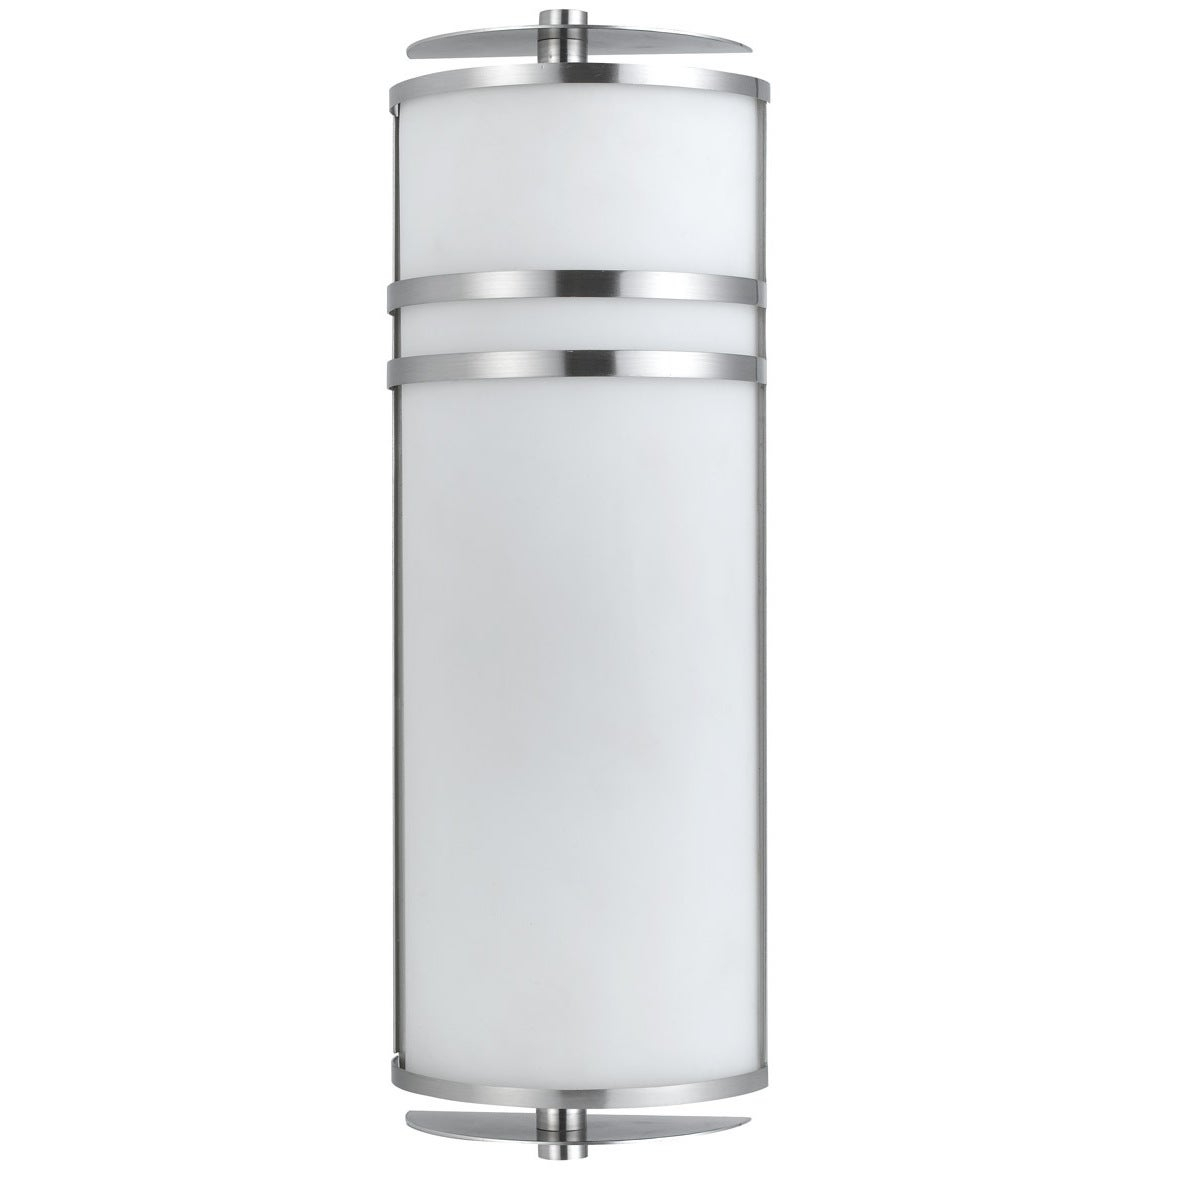 Silver-tone Metal and White Glass 2-light 20-watt GU24 So...